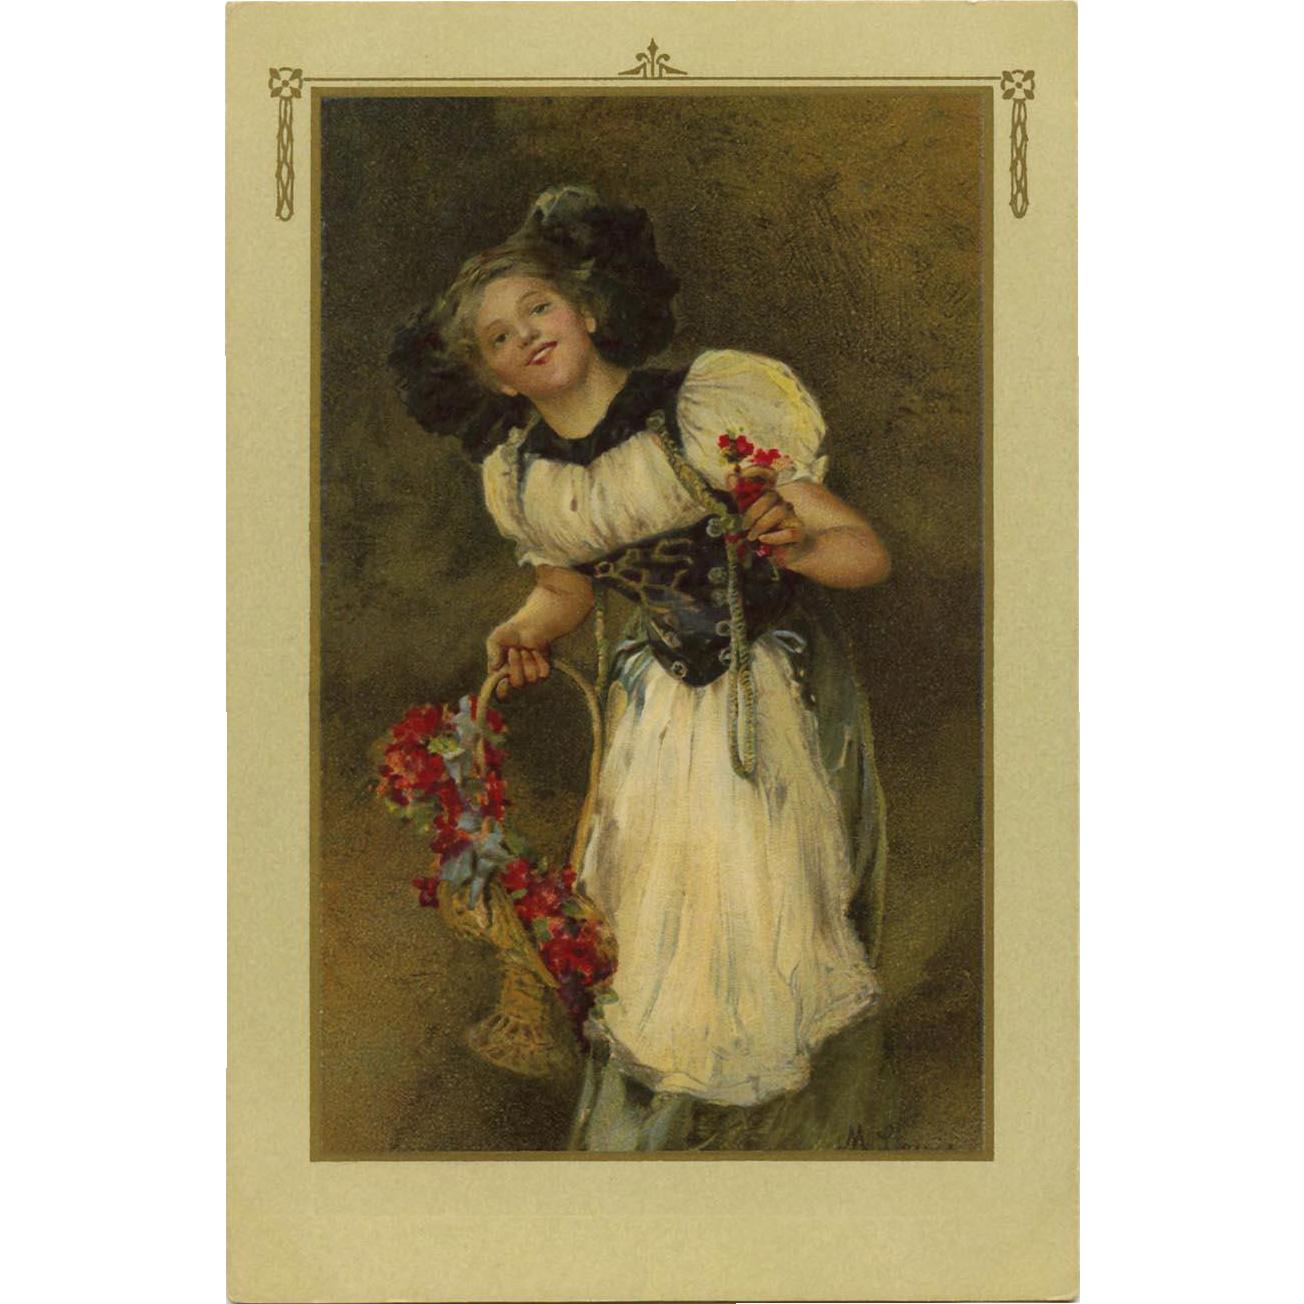 Artist Signed Portrait Postcard of French Alsatian Girl in Regional Costume